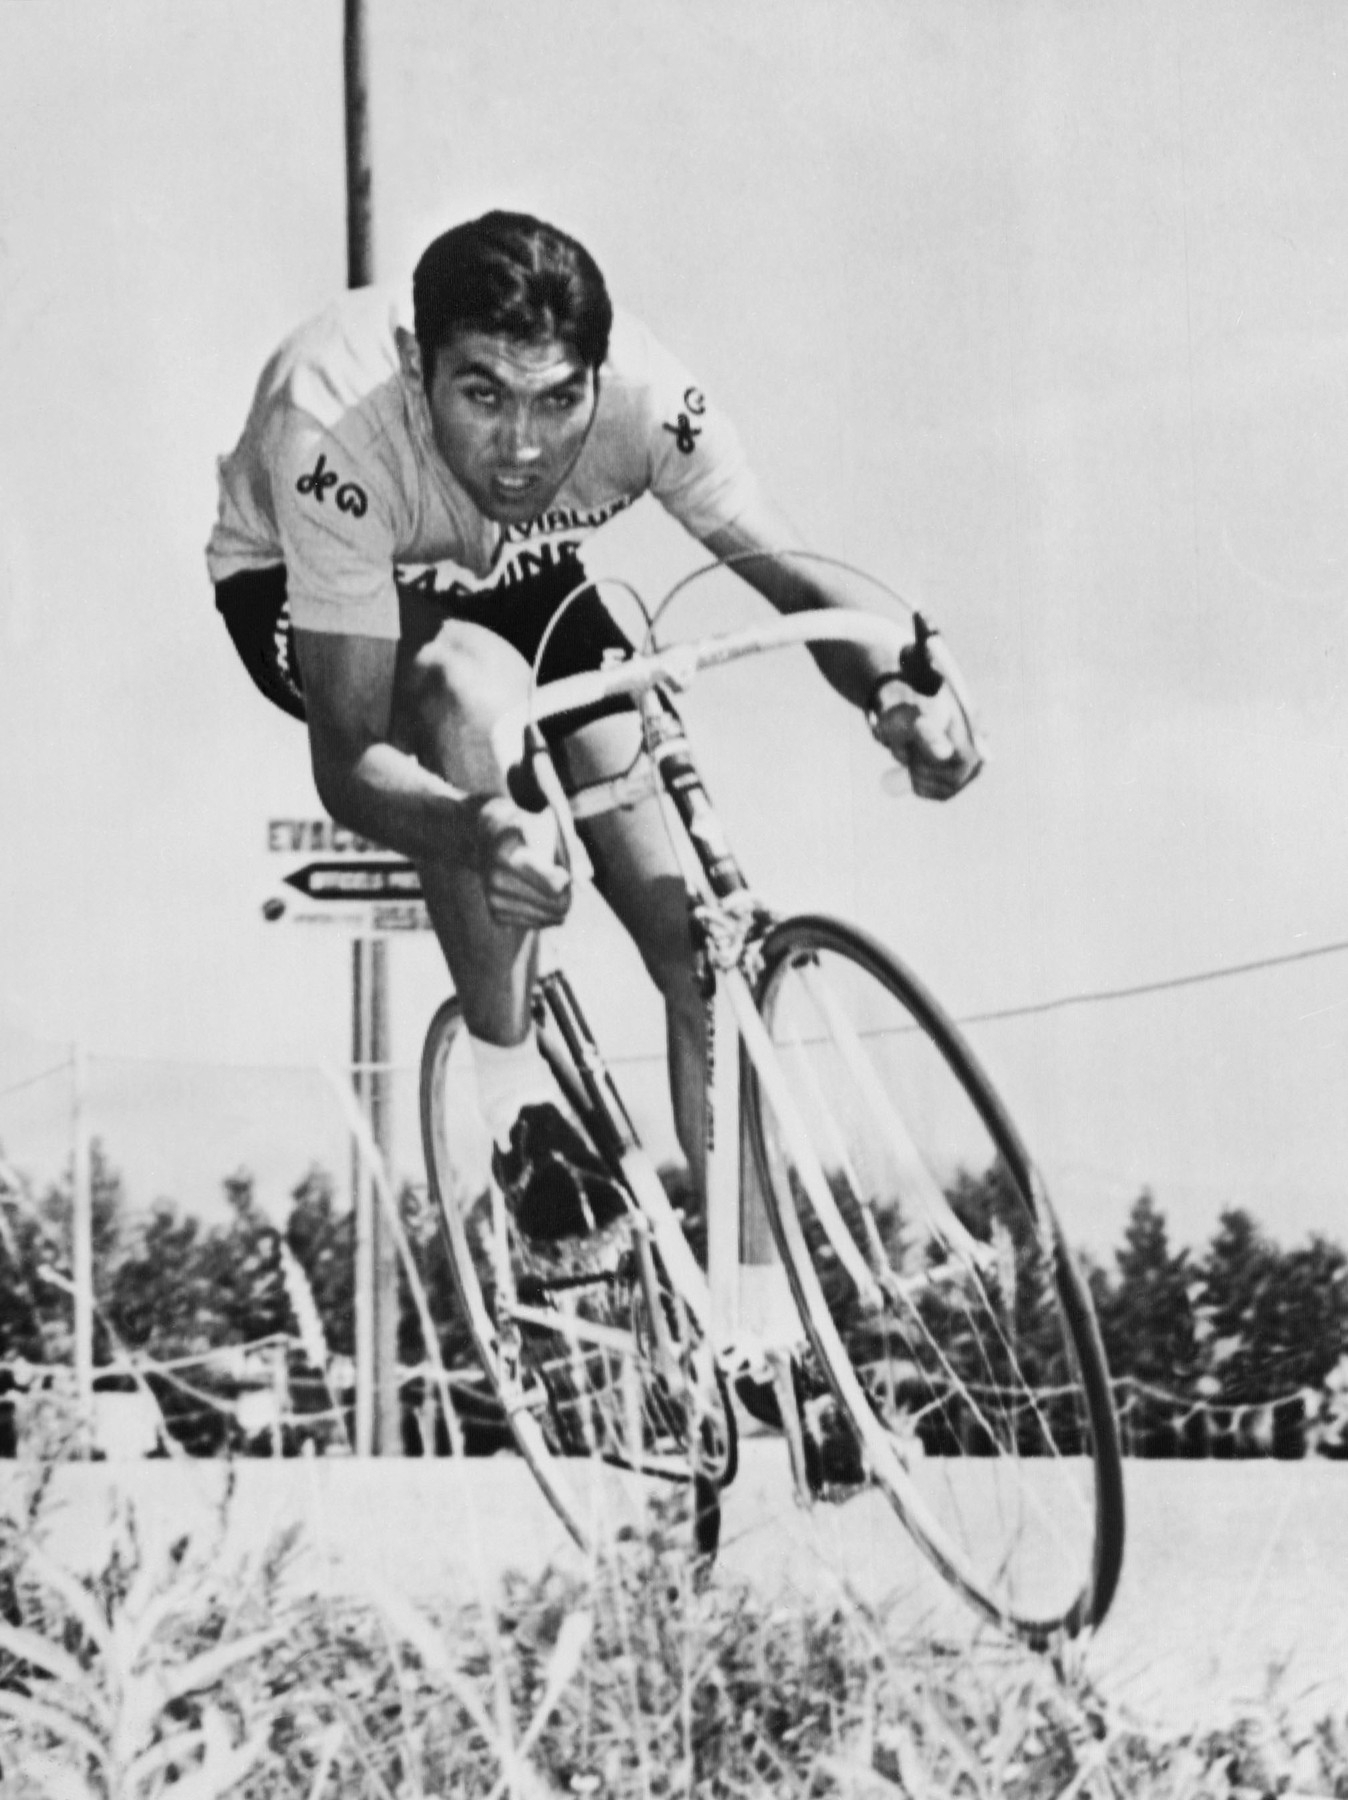 Kanibal Eddy Merckx na trase Tour de France 1970. Foto: profimedia